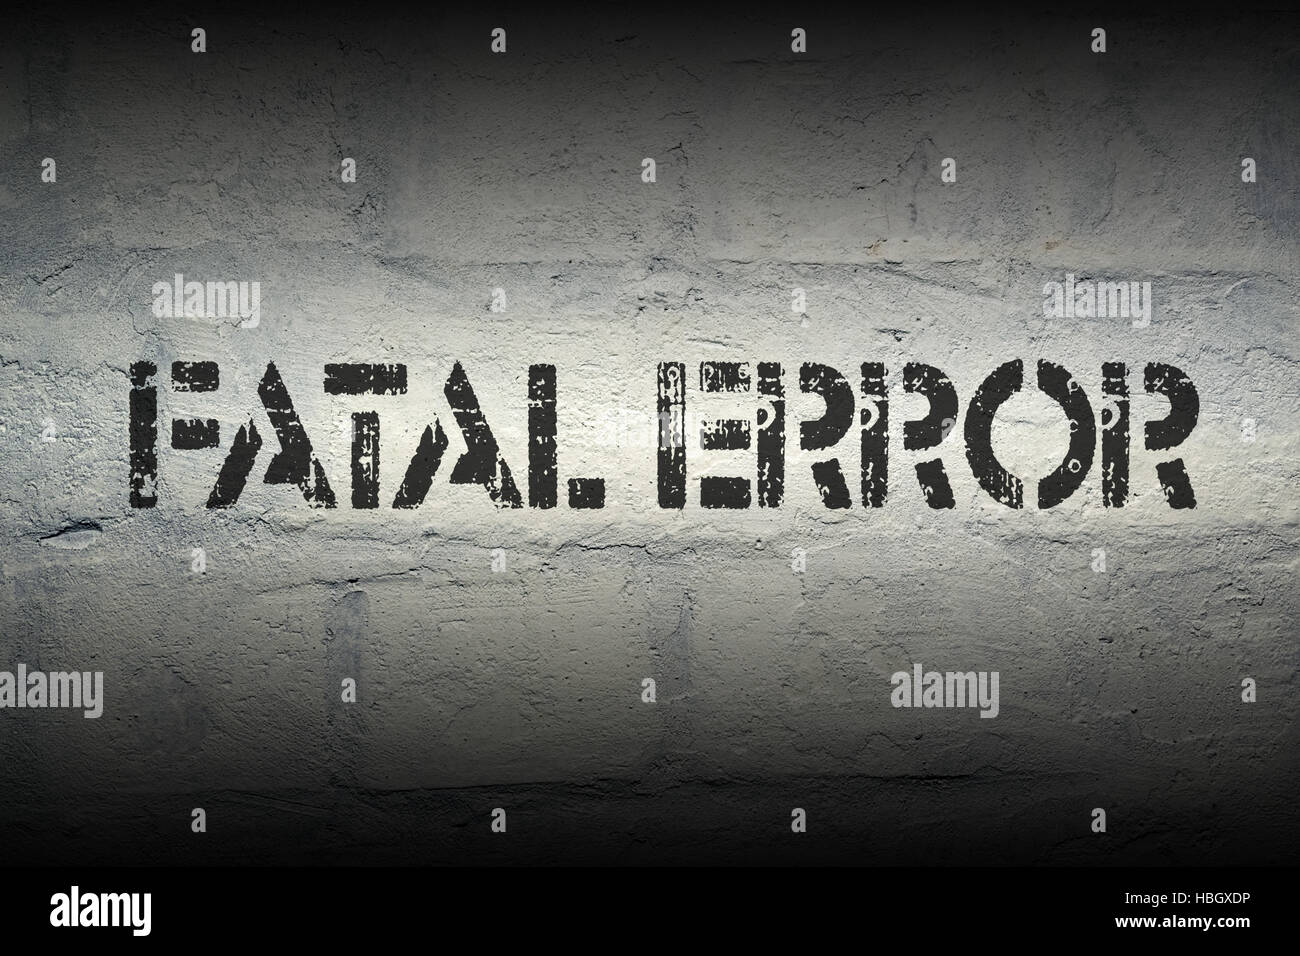 fatal error - Stock Image